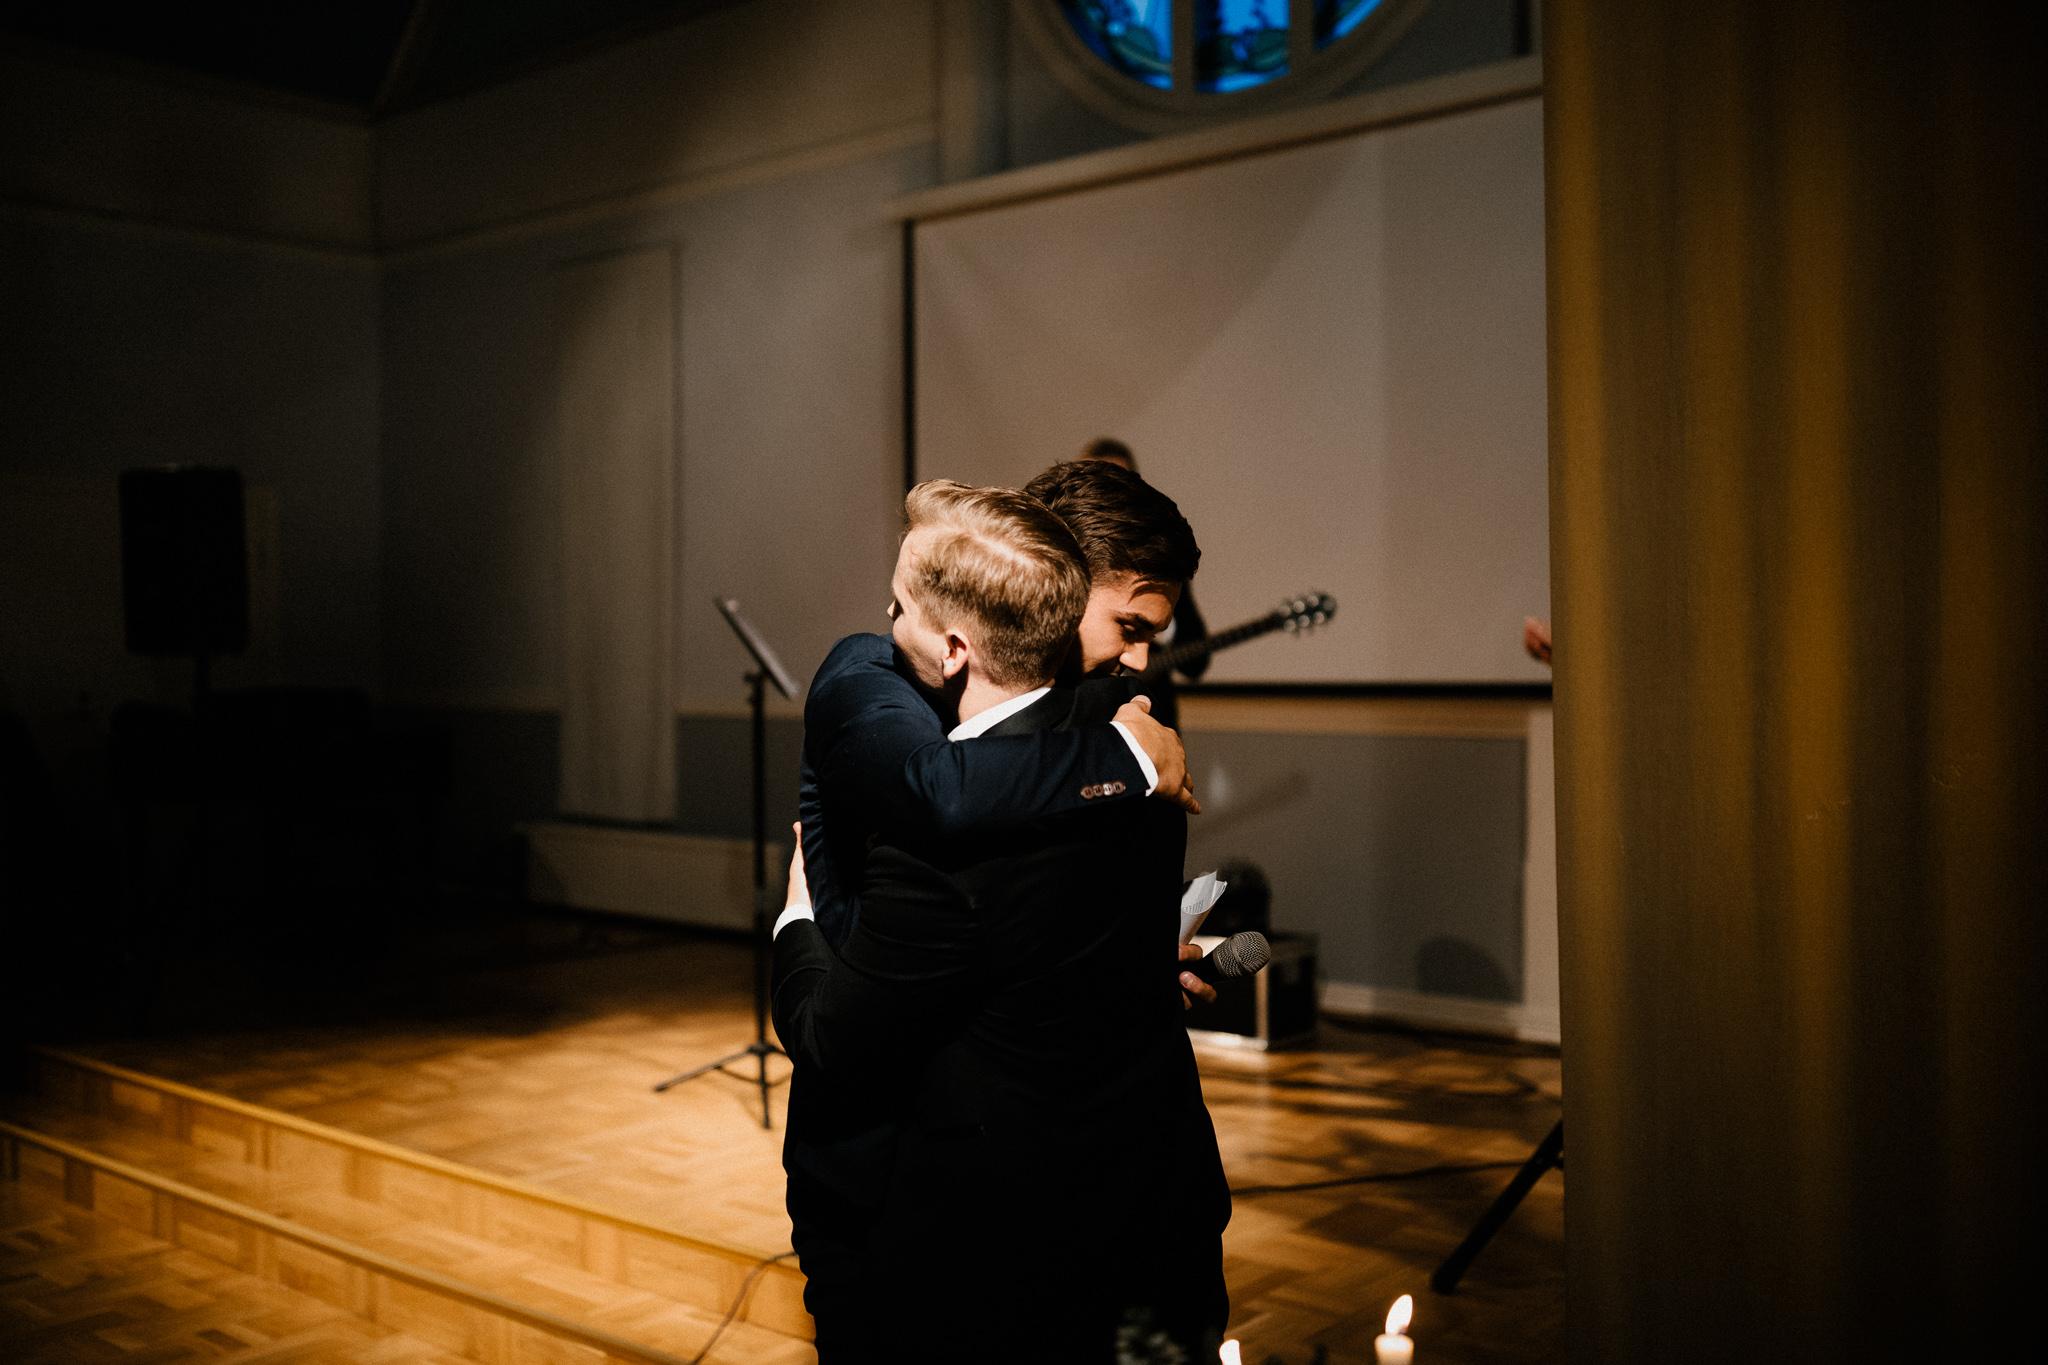 Johanna + Mikko - Tampere - Photo by Patrick Karkkolainen Wedding Photographer-183.jpg